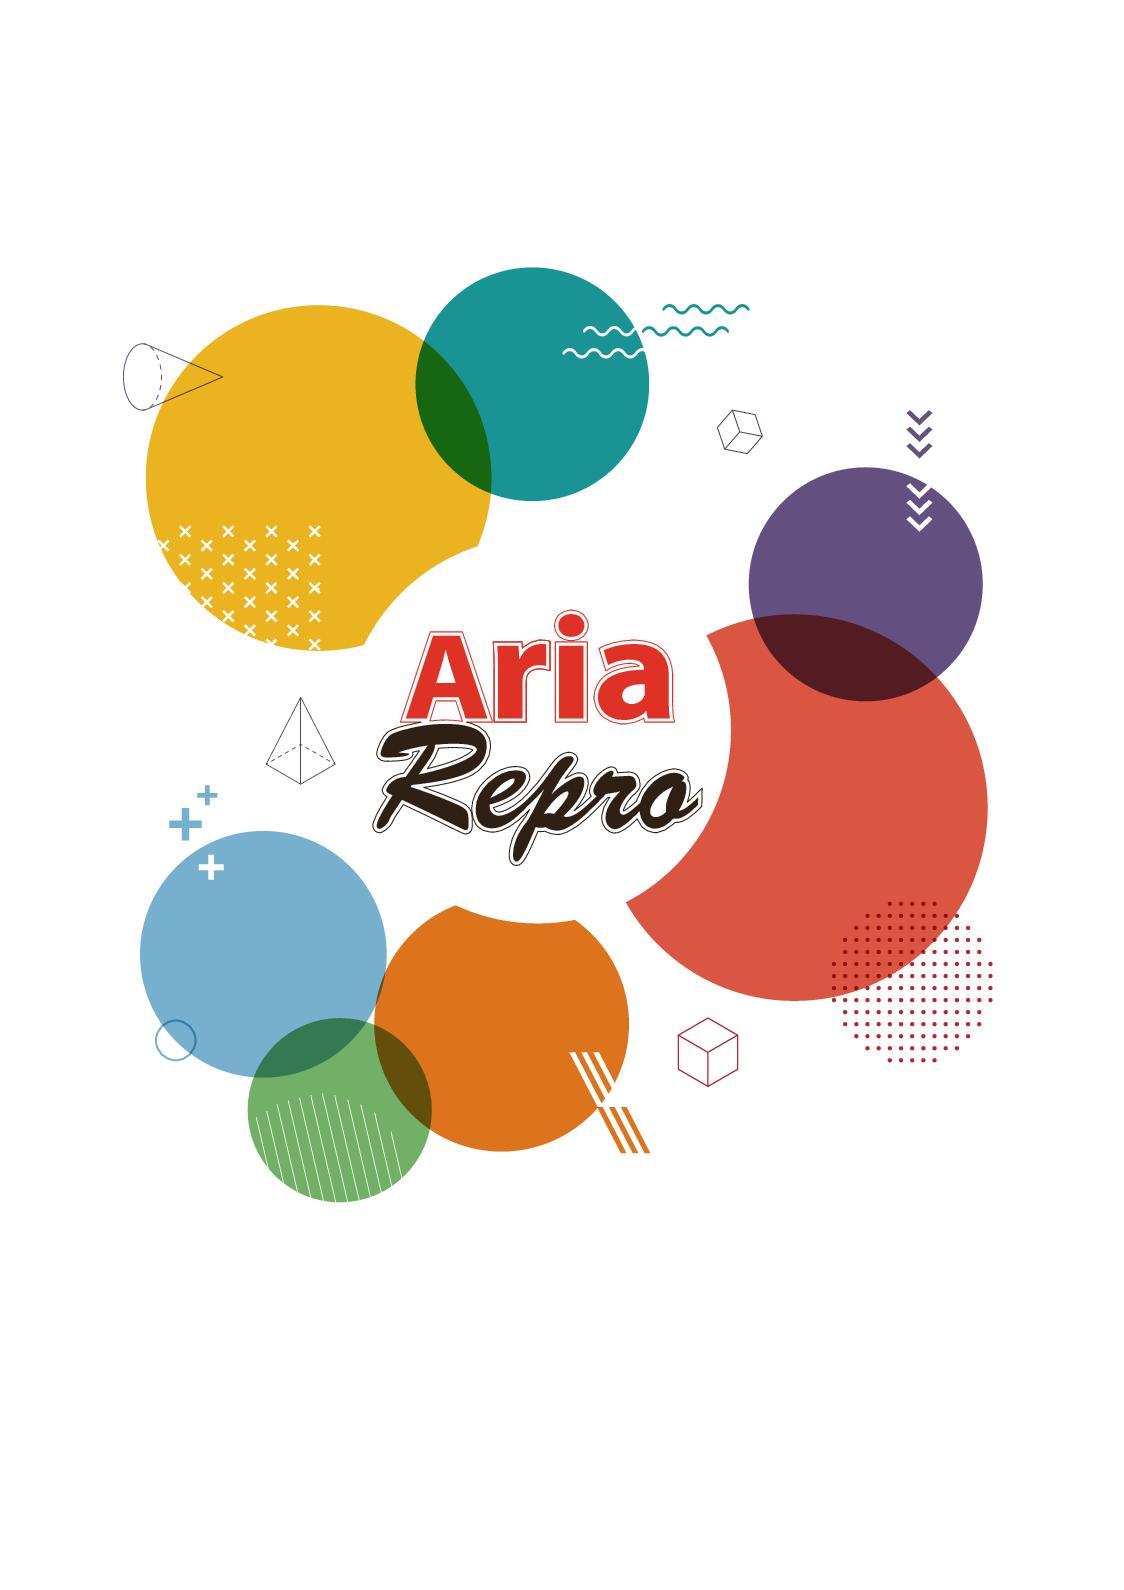 Catalogue Communication | Aria Repro